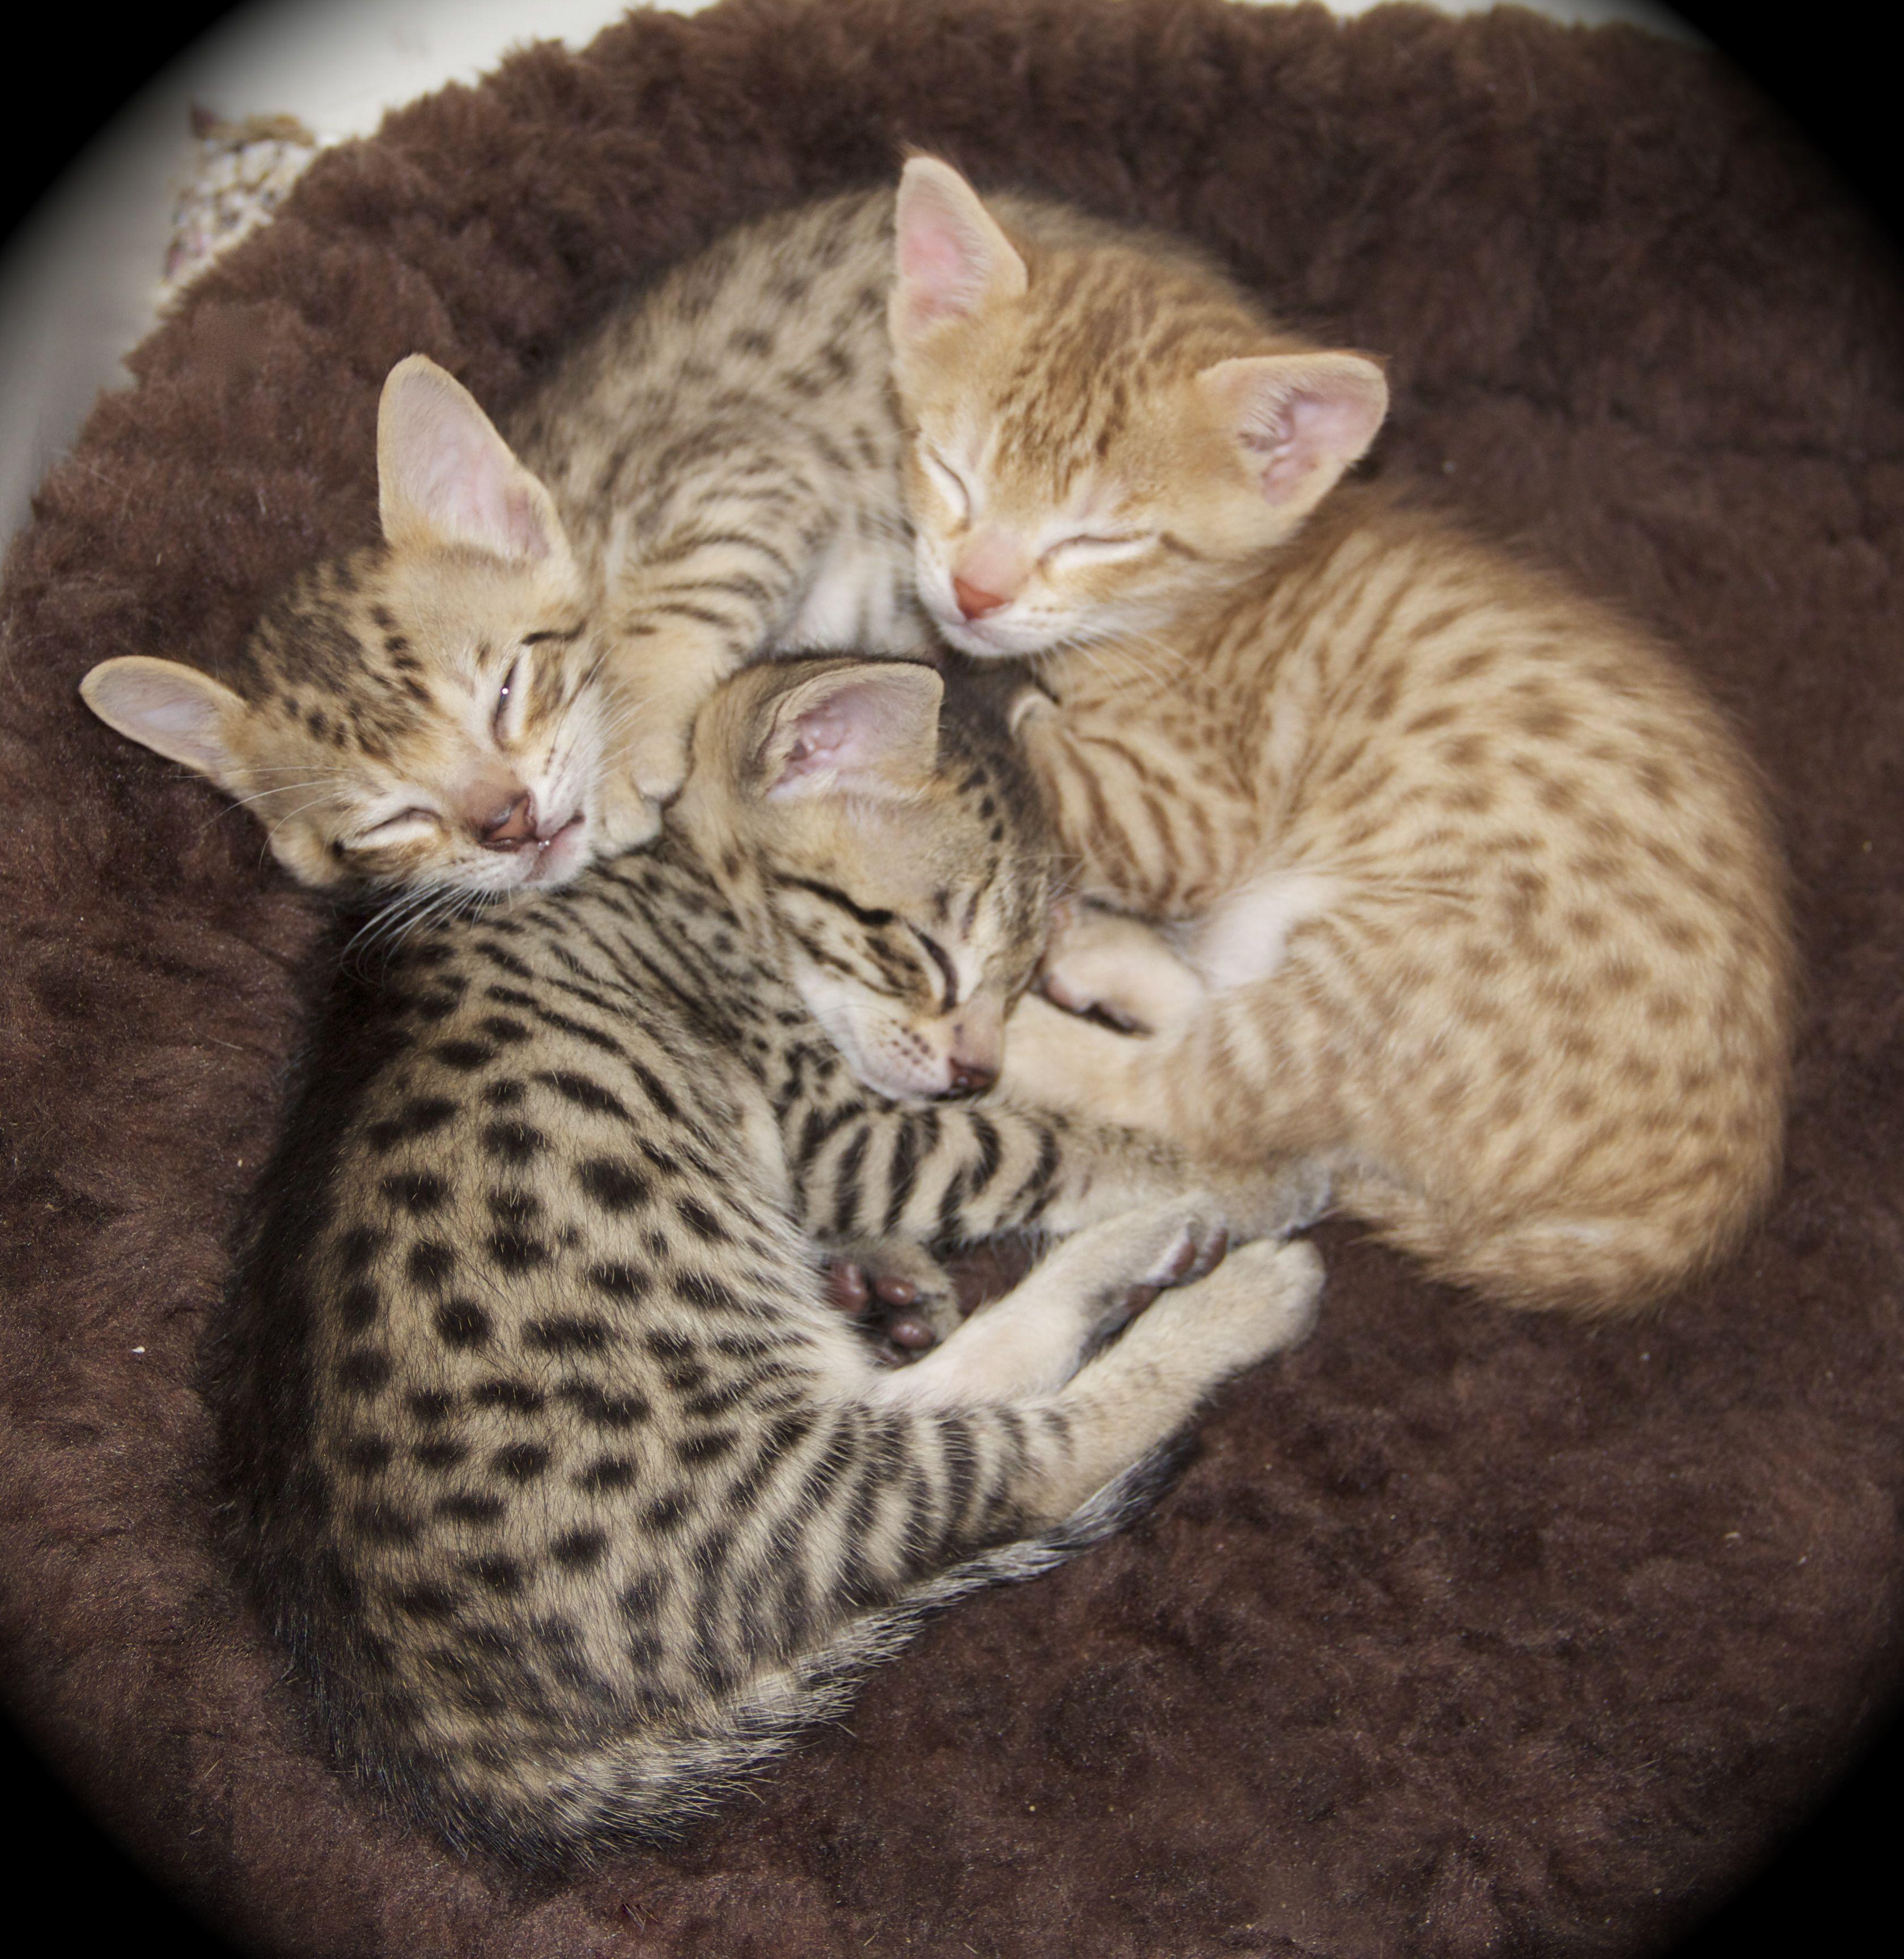 Savannah Kitten: Savannah Savannah Kittens F Sbt Breed